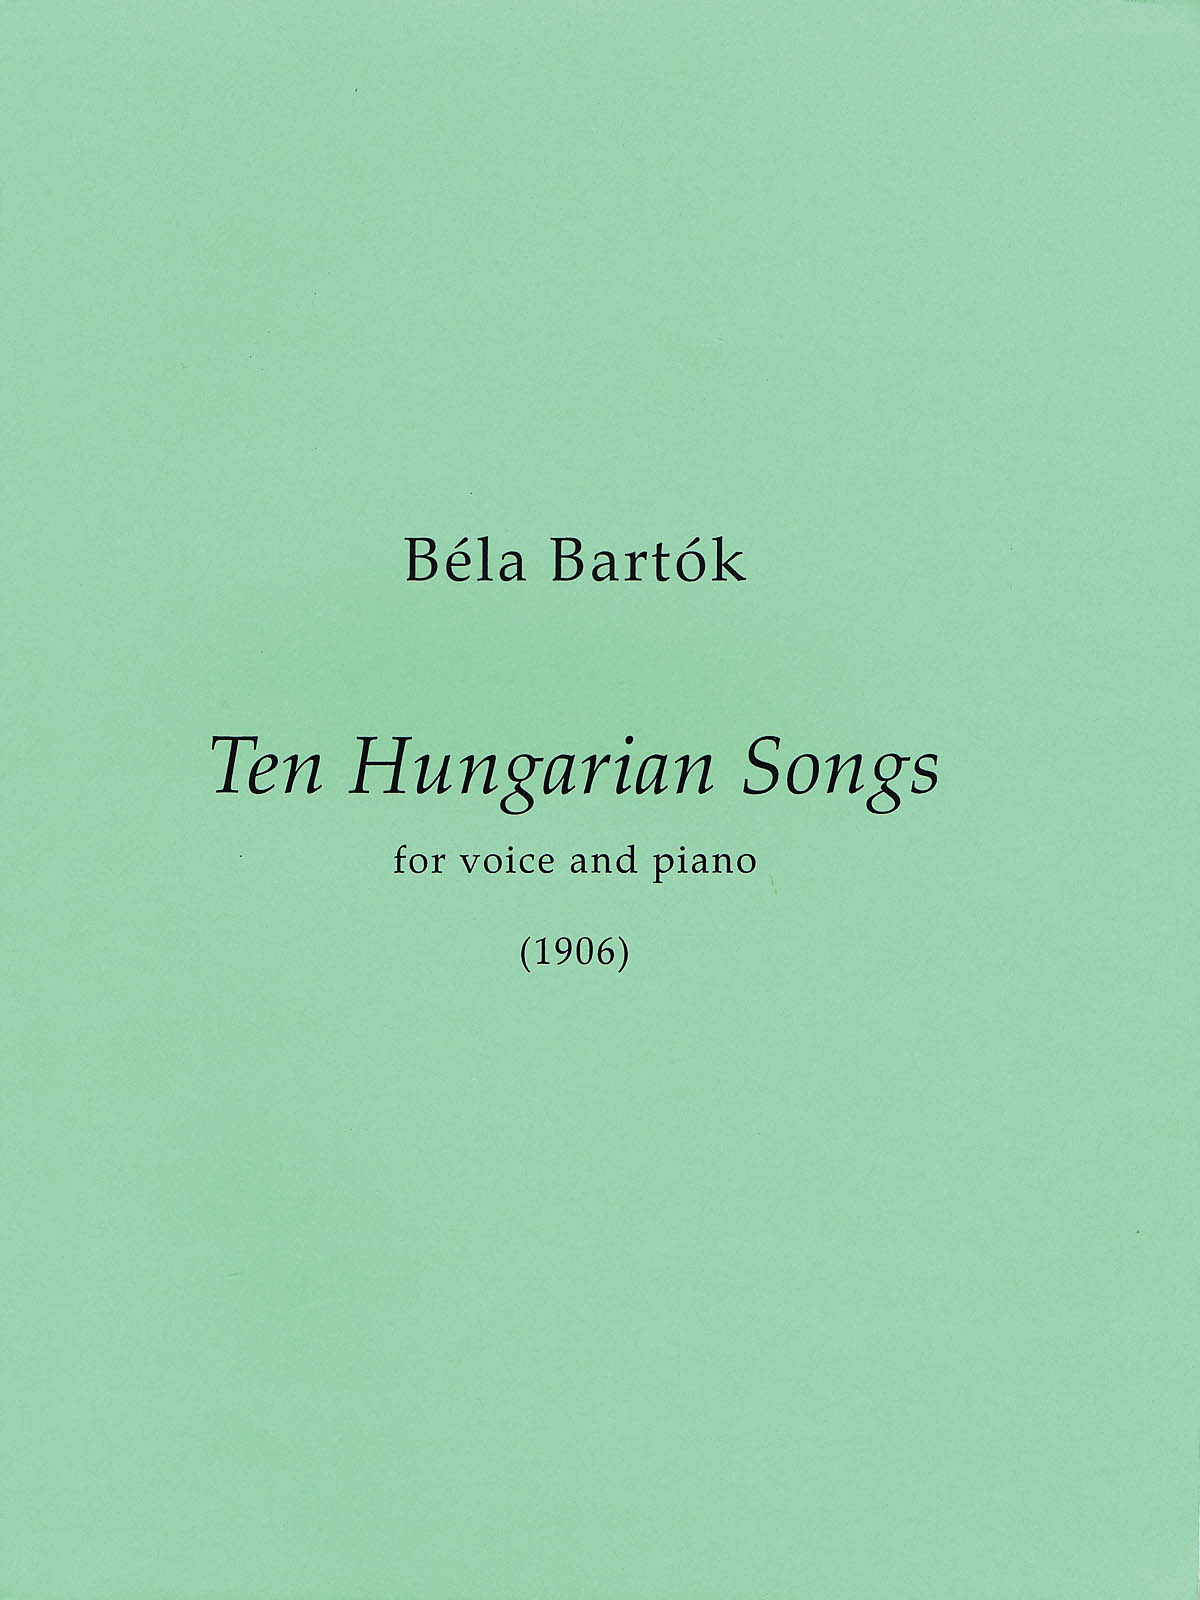 Béla Bartók: 10 Hungarian Songs: Vocal Solo: Vocal Collection